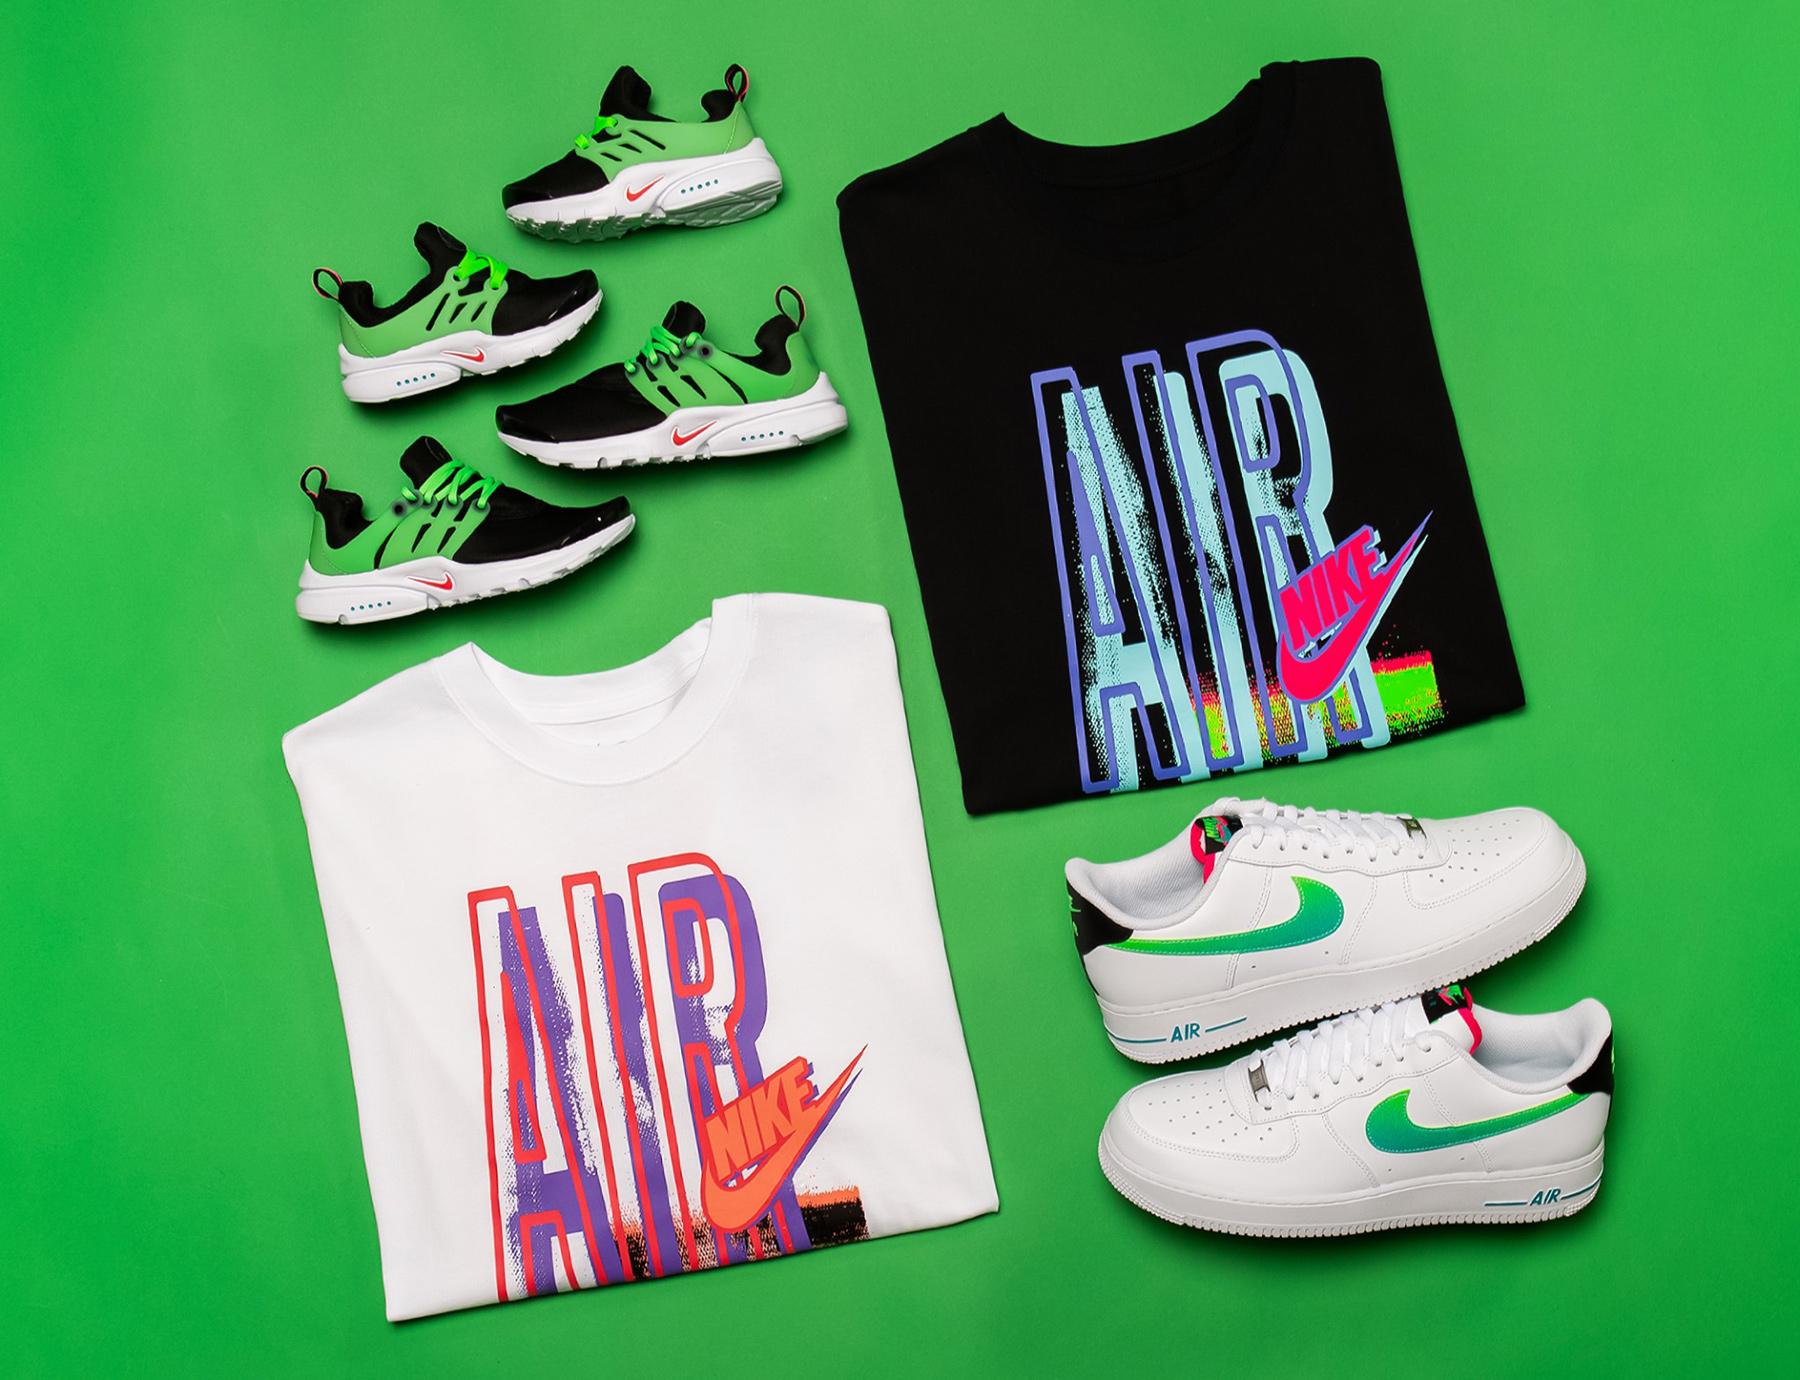 nike-air-futura-dna-sneakers-and-shirts